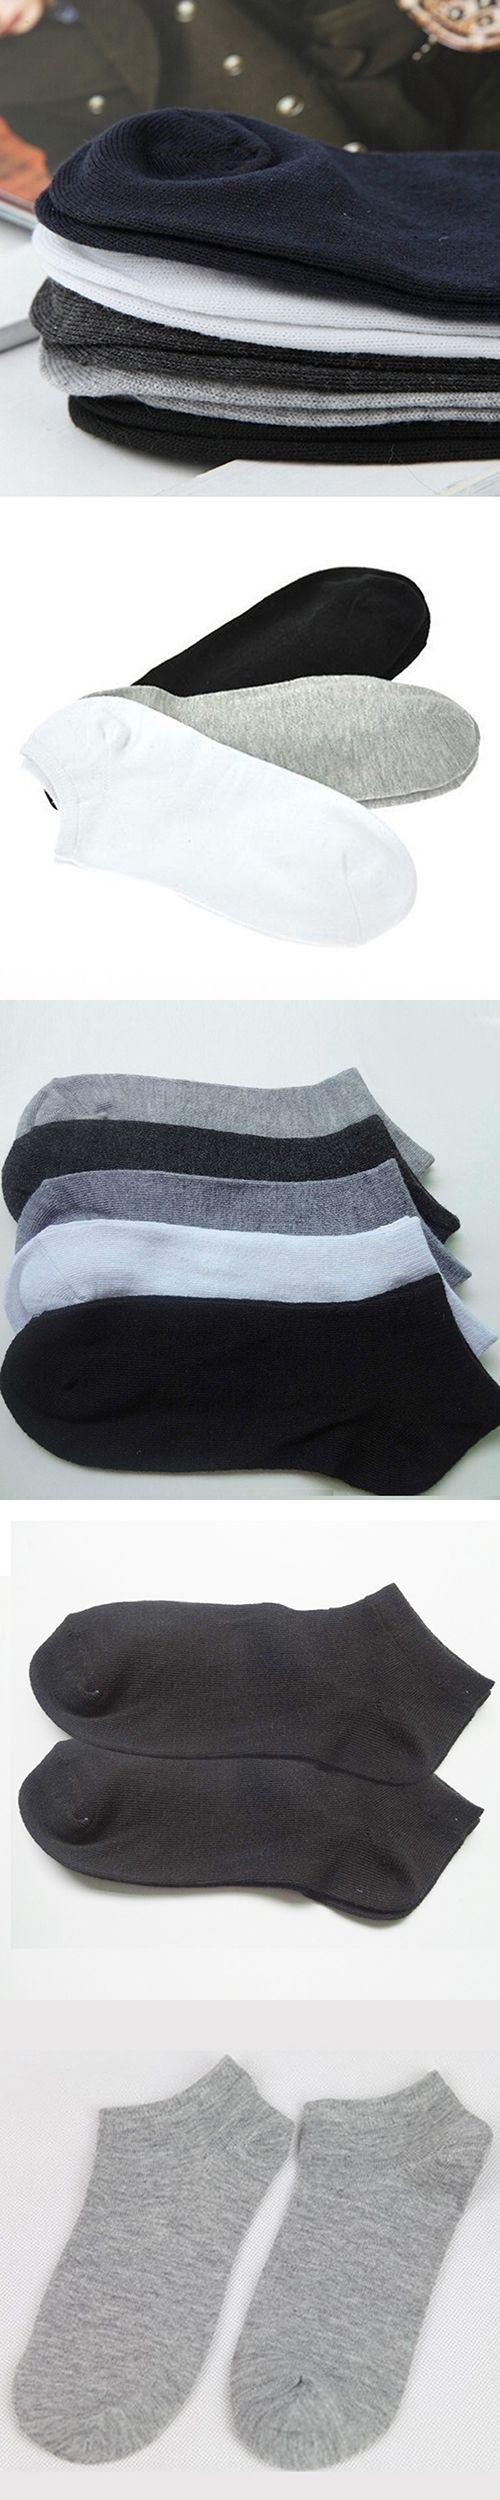 Men Summer Fashion Acrylic Fiber Soft Sock Sexy Breathable Short Ankle Socks New Arrival